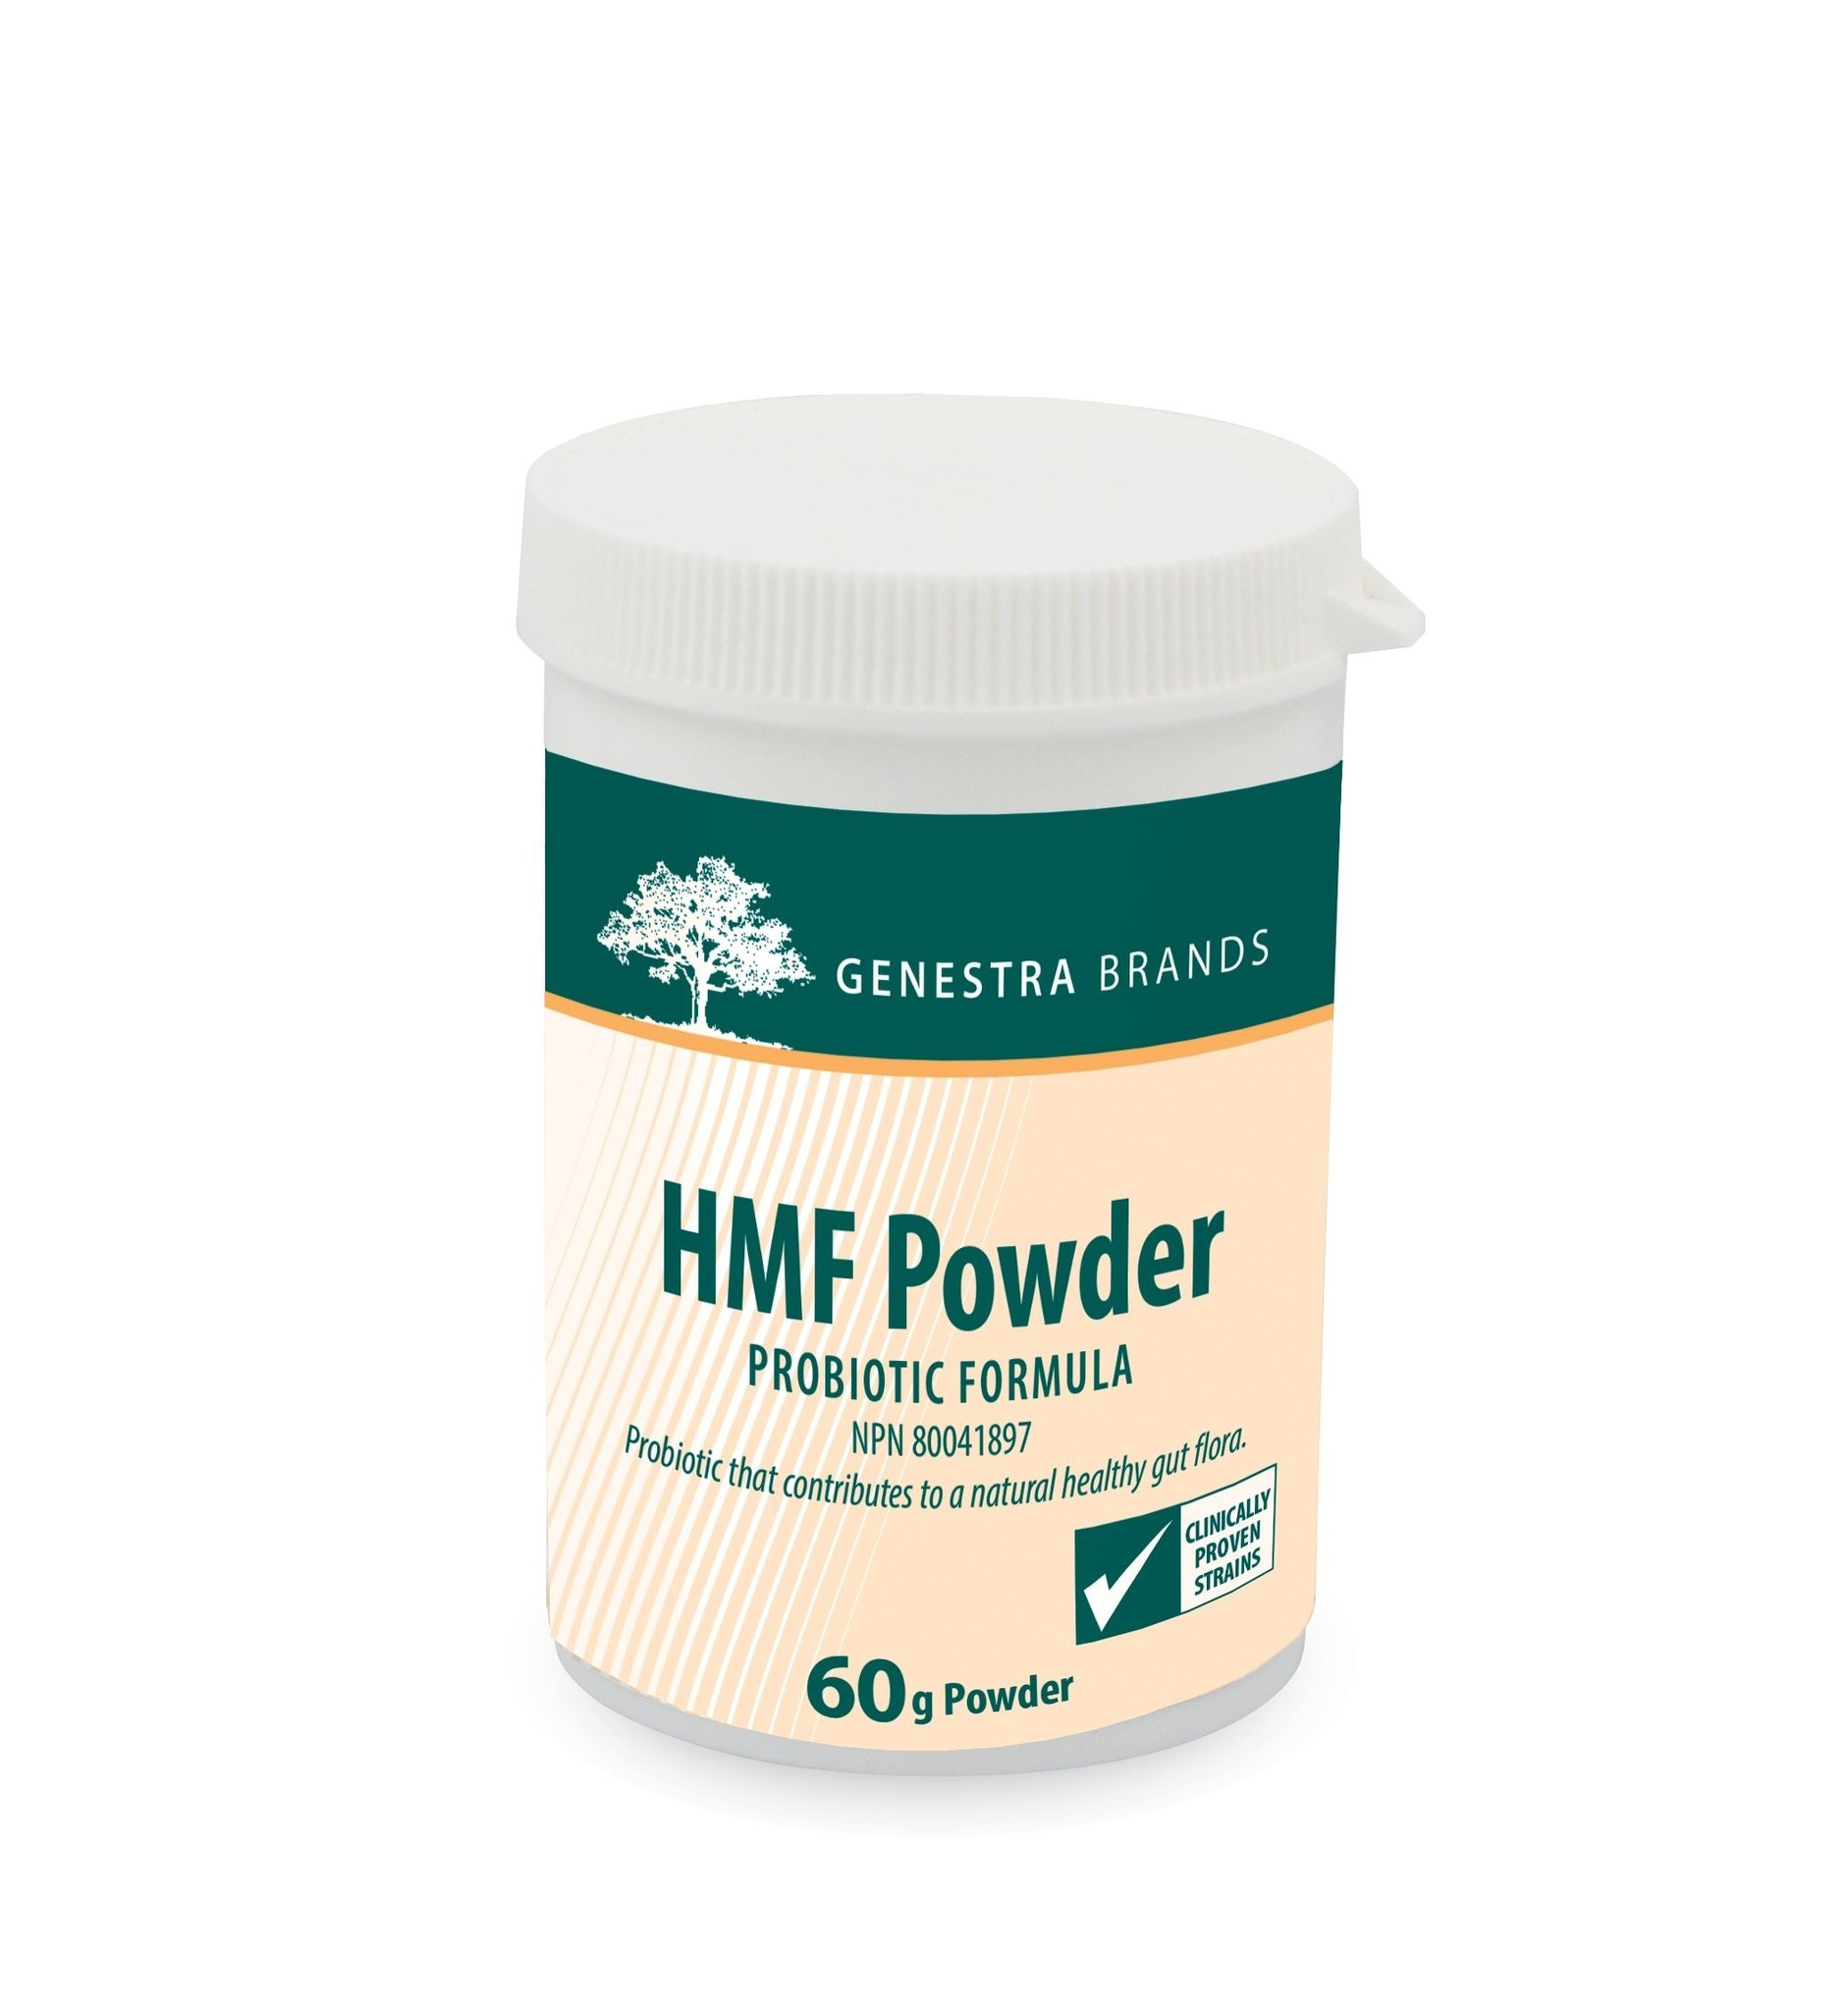 Genestra HMF Powder - 60g